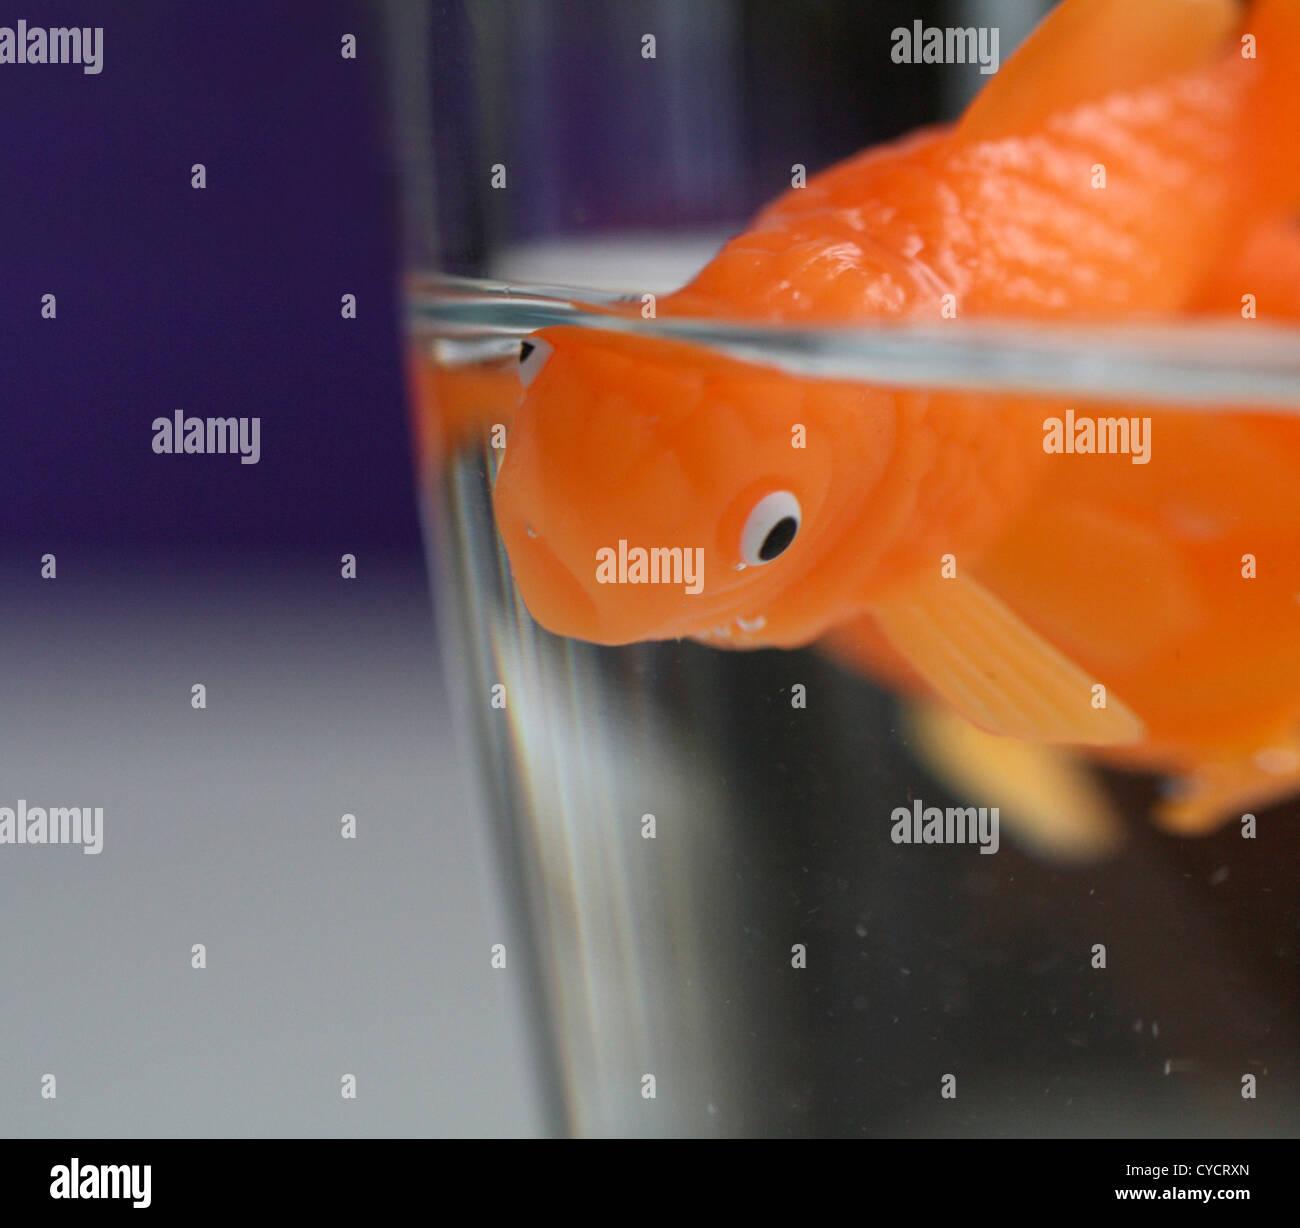 livestock breeding,goldfish,fishbowl - Stock Image